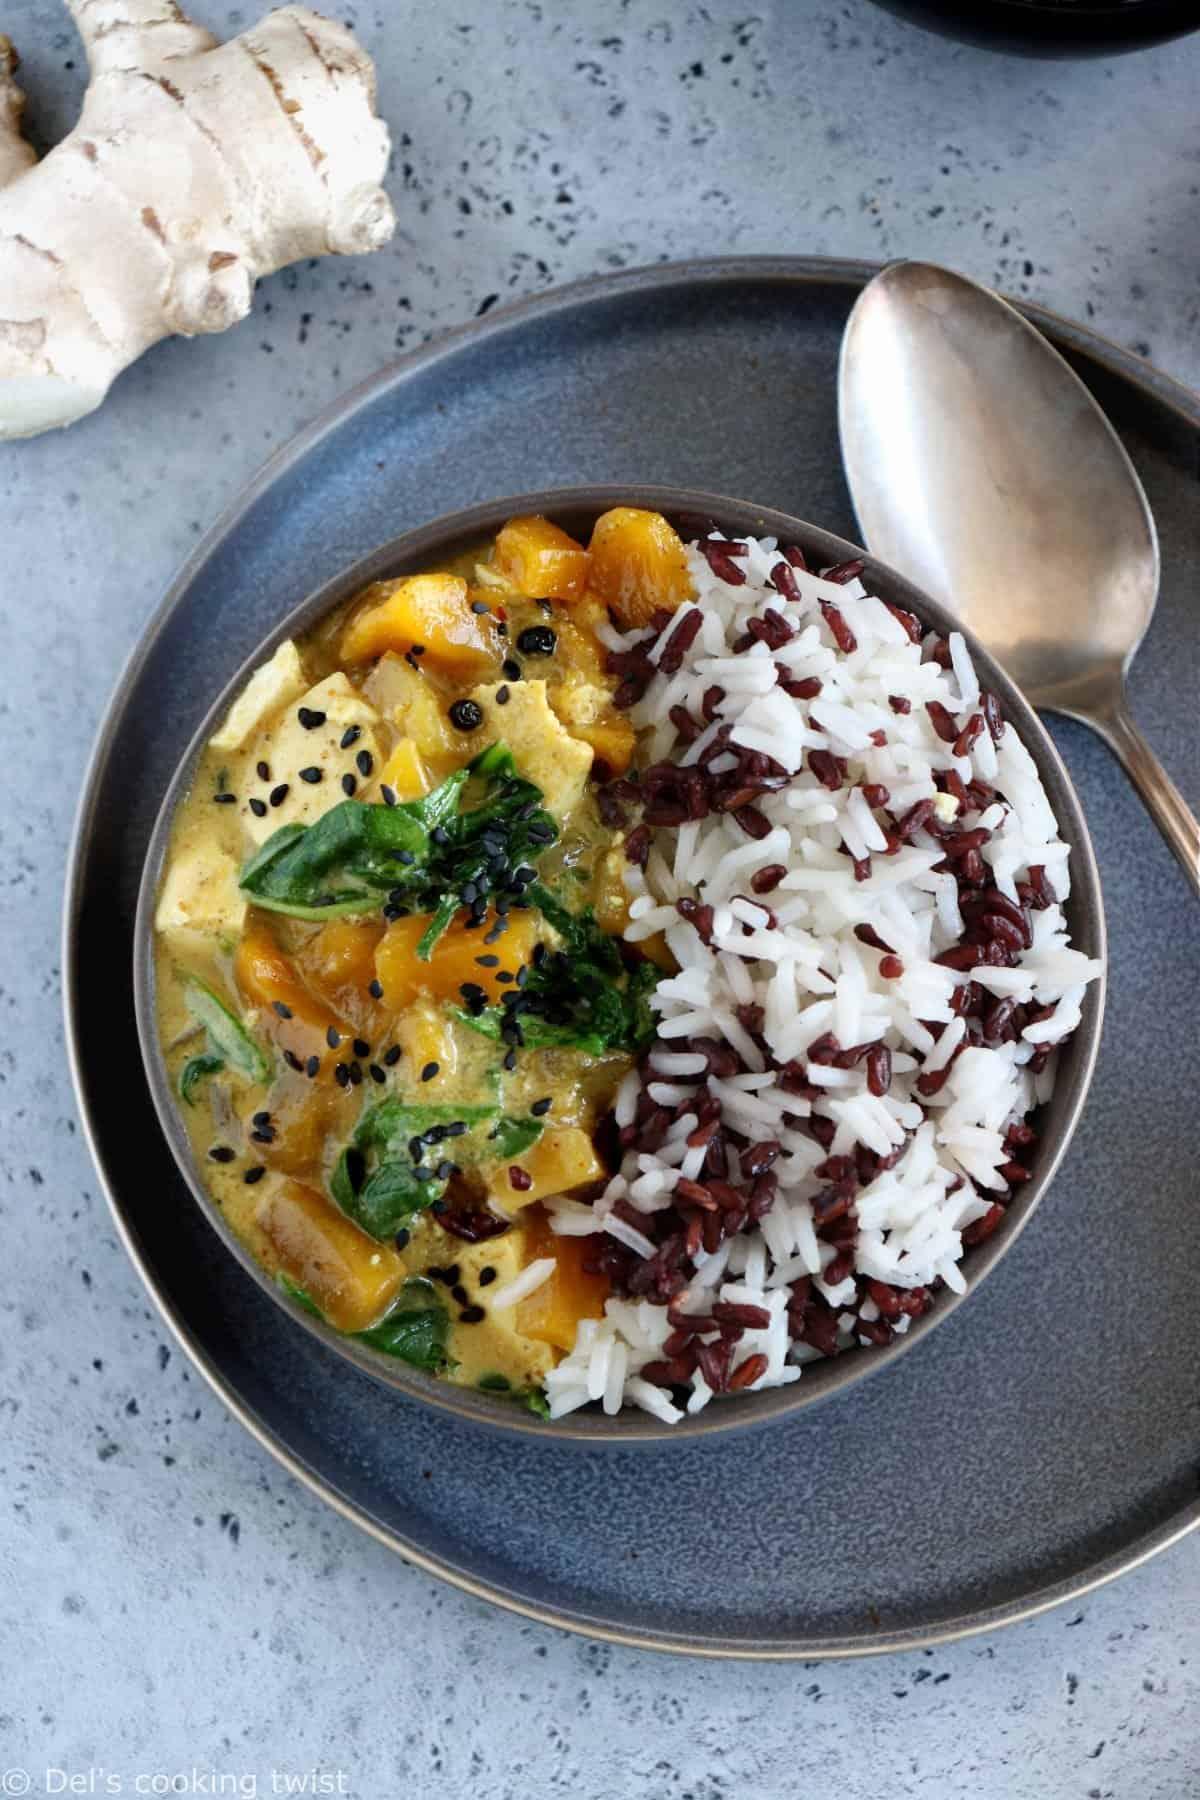 Mango Chutney Tofu Curry with Wild Rice (vegan, gluten-free)